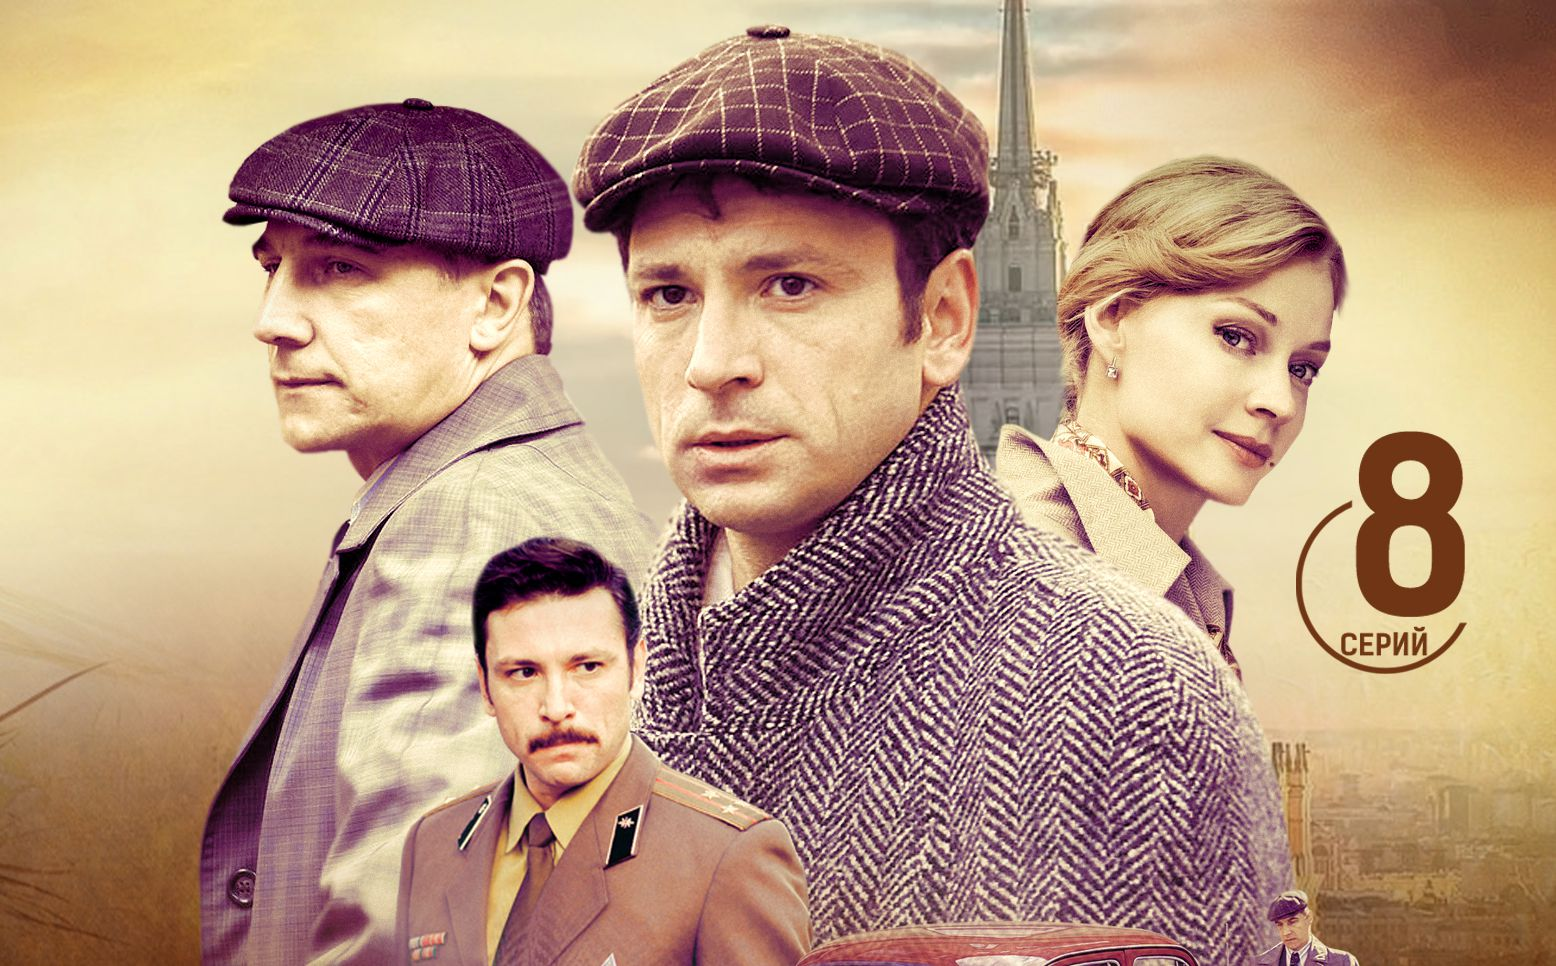 Казанова (8 серий) (2020)